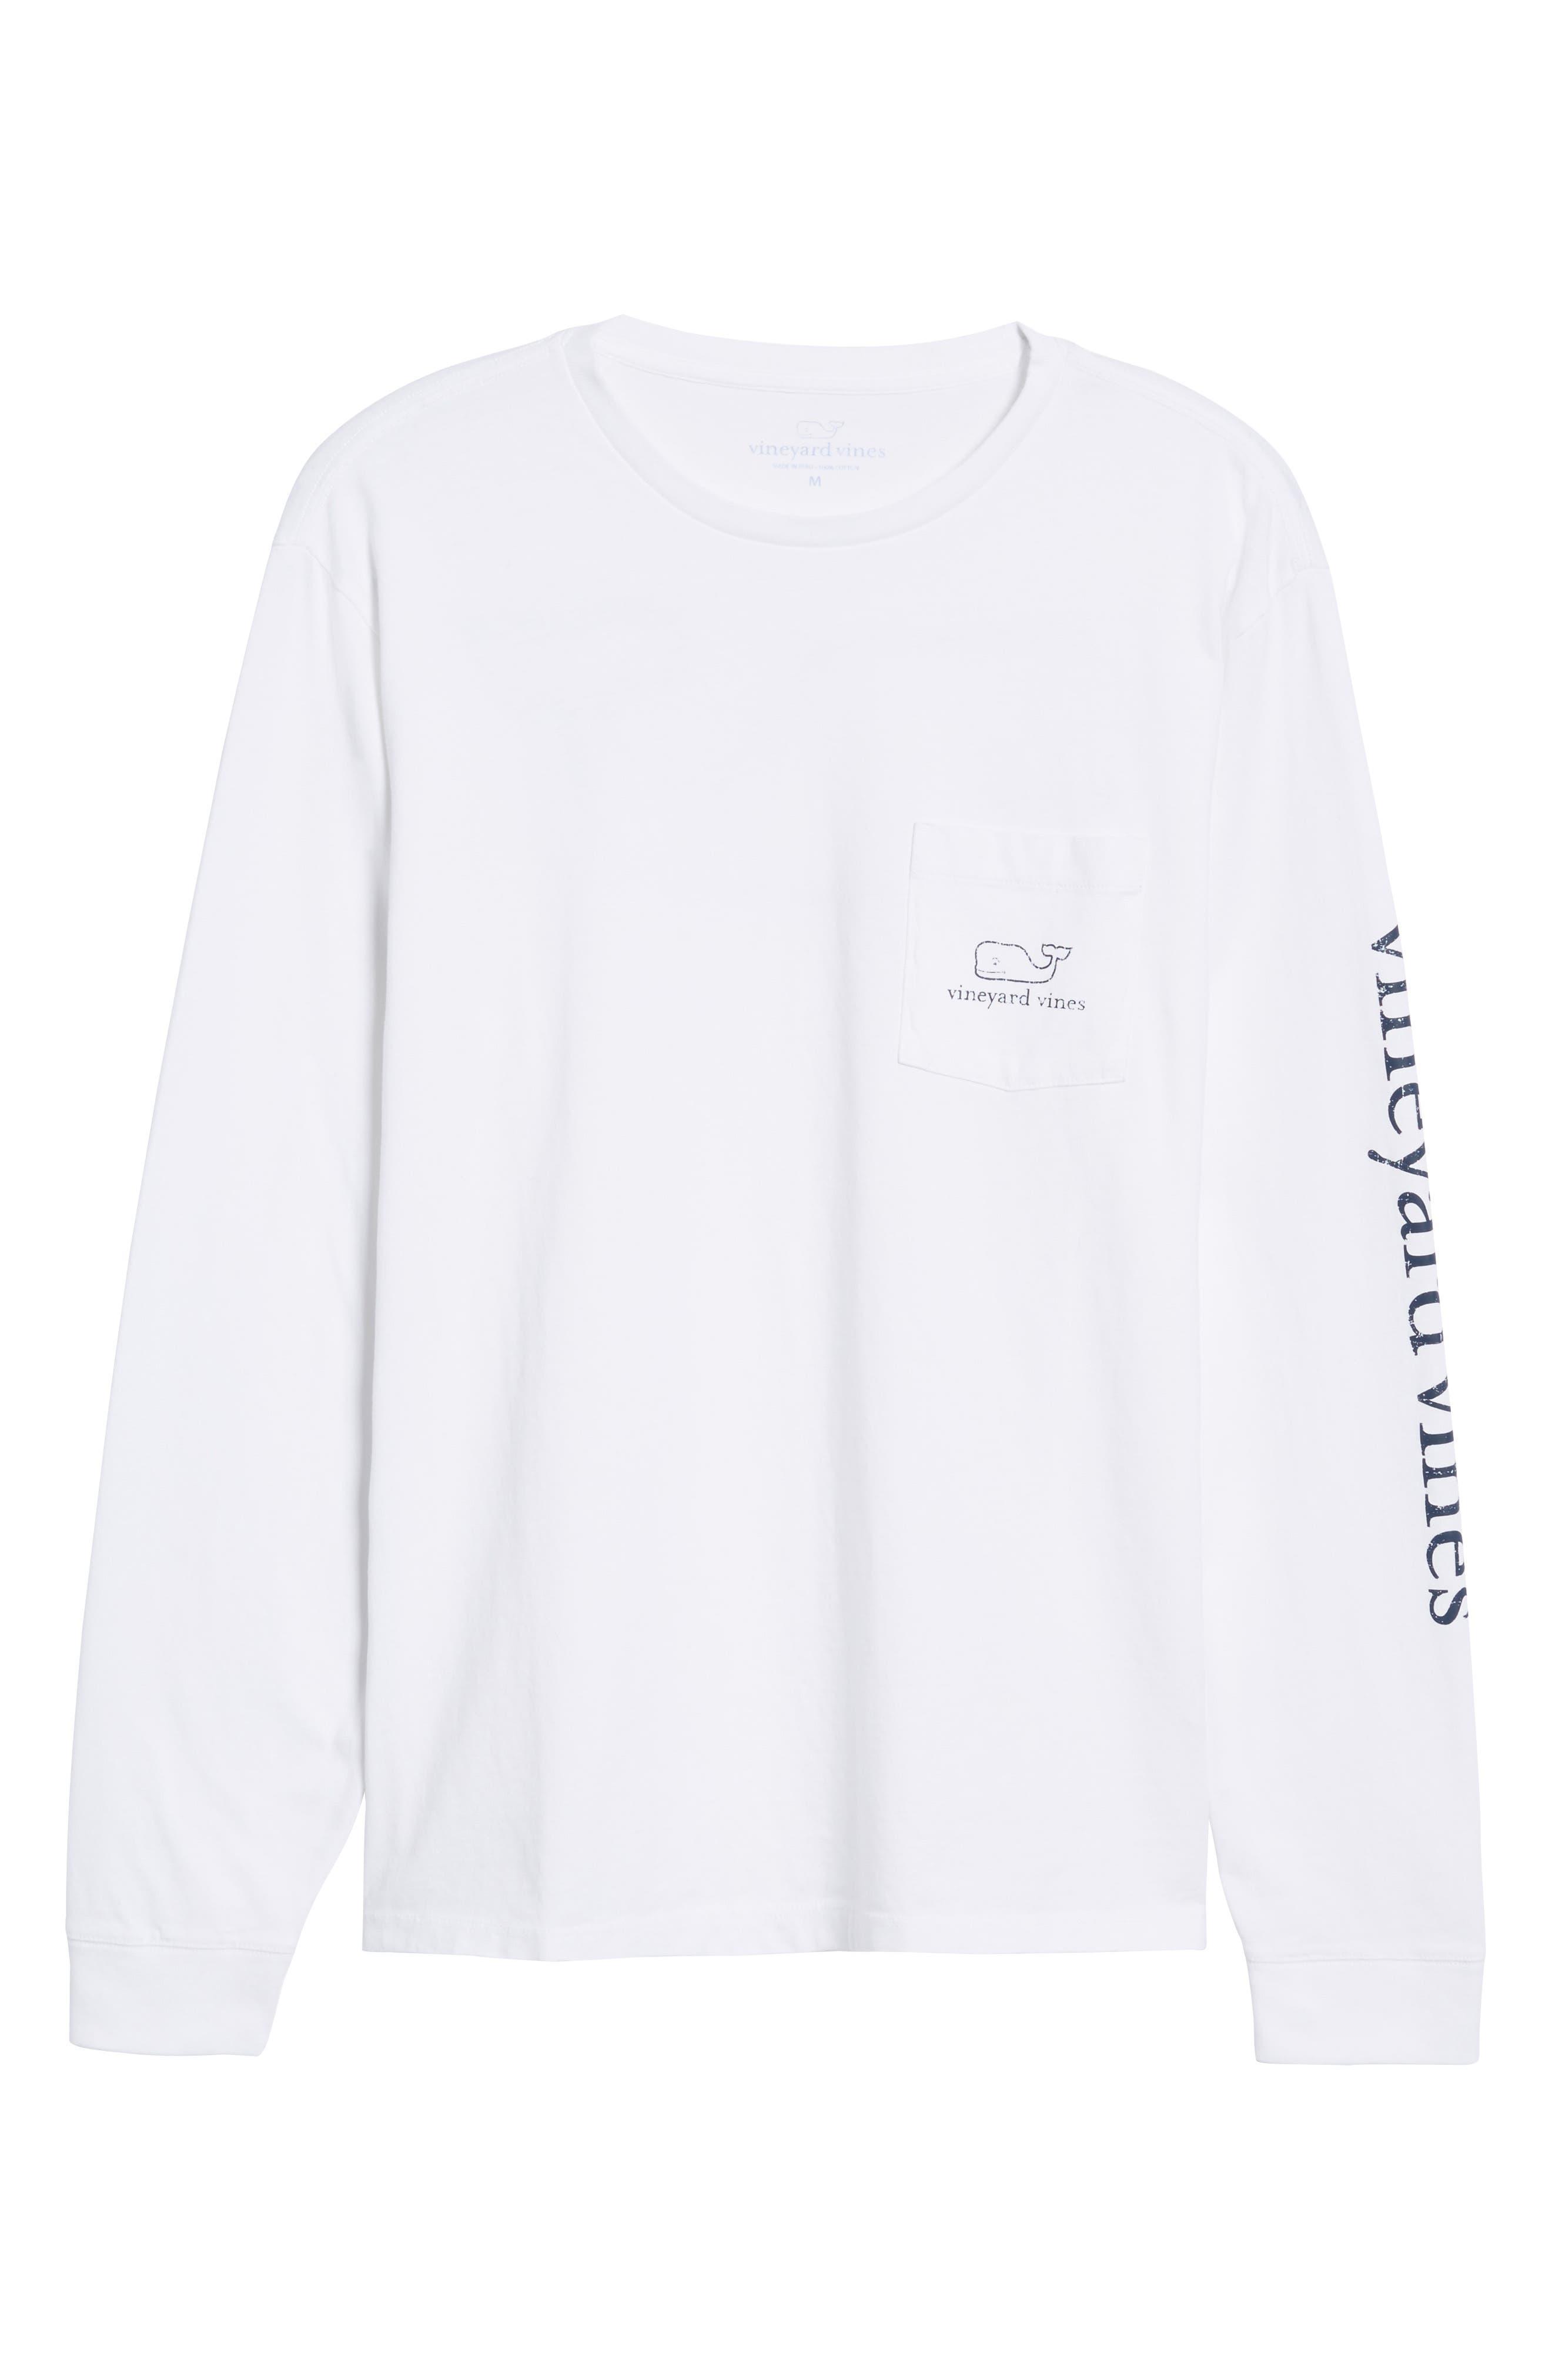 Vintage Long Sleeve Pocket T-Shirt, Main, color, WHITE CAP